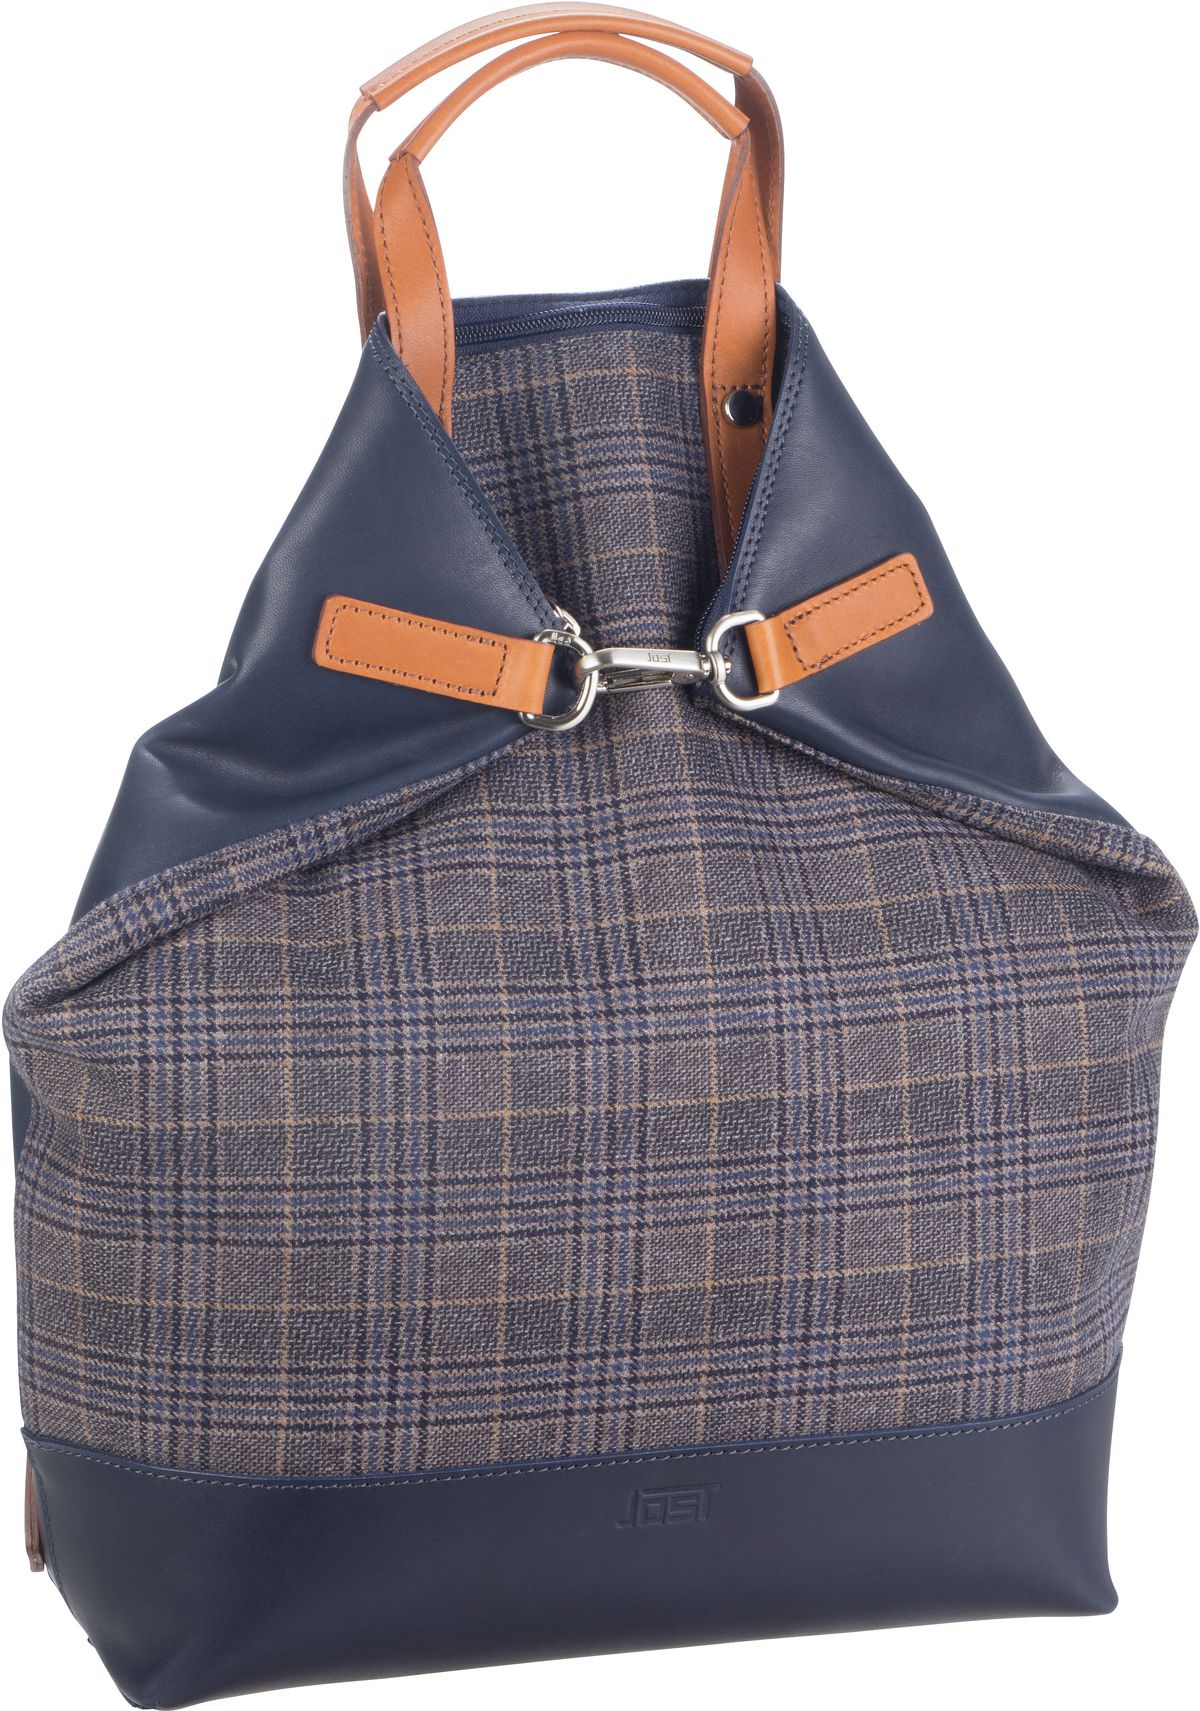 Rucksack / Daypack Checks 7235 X-Change Bag S Grey